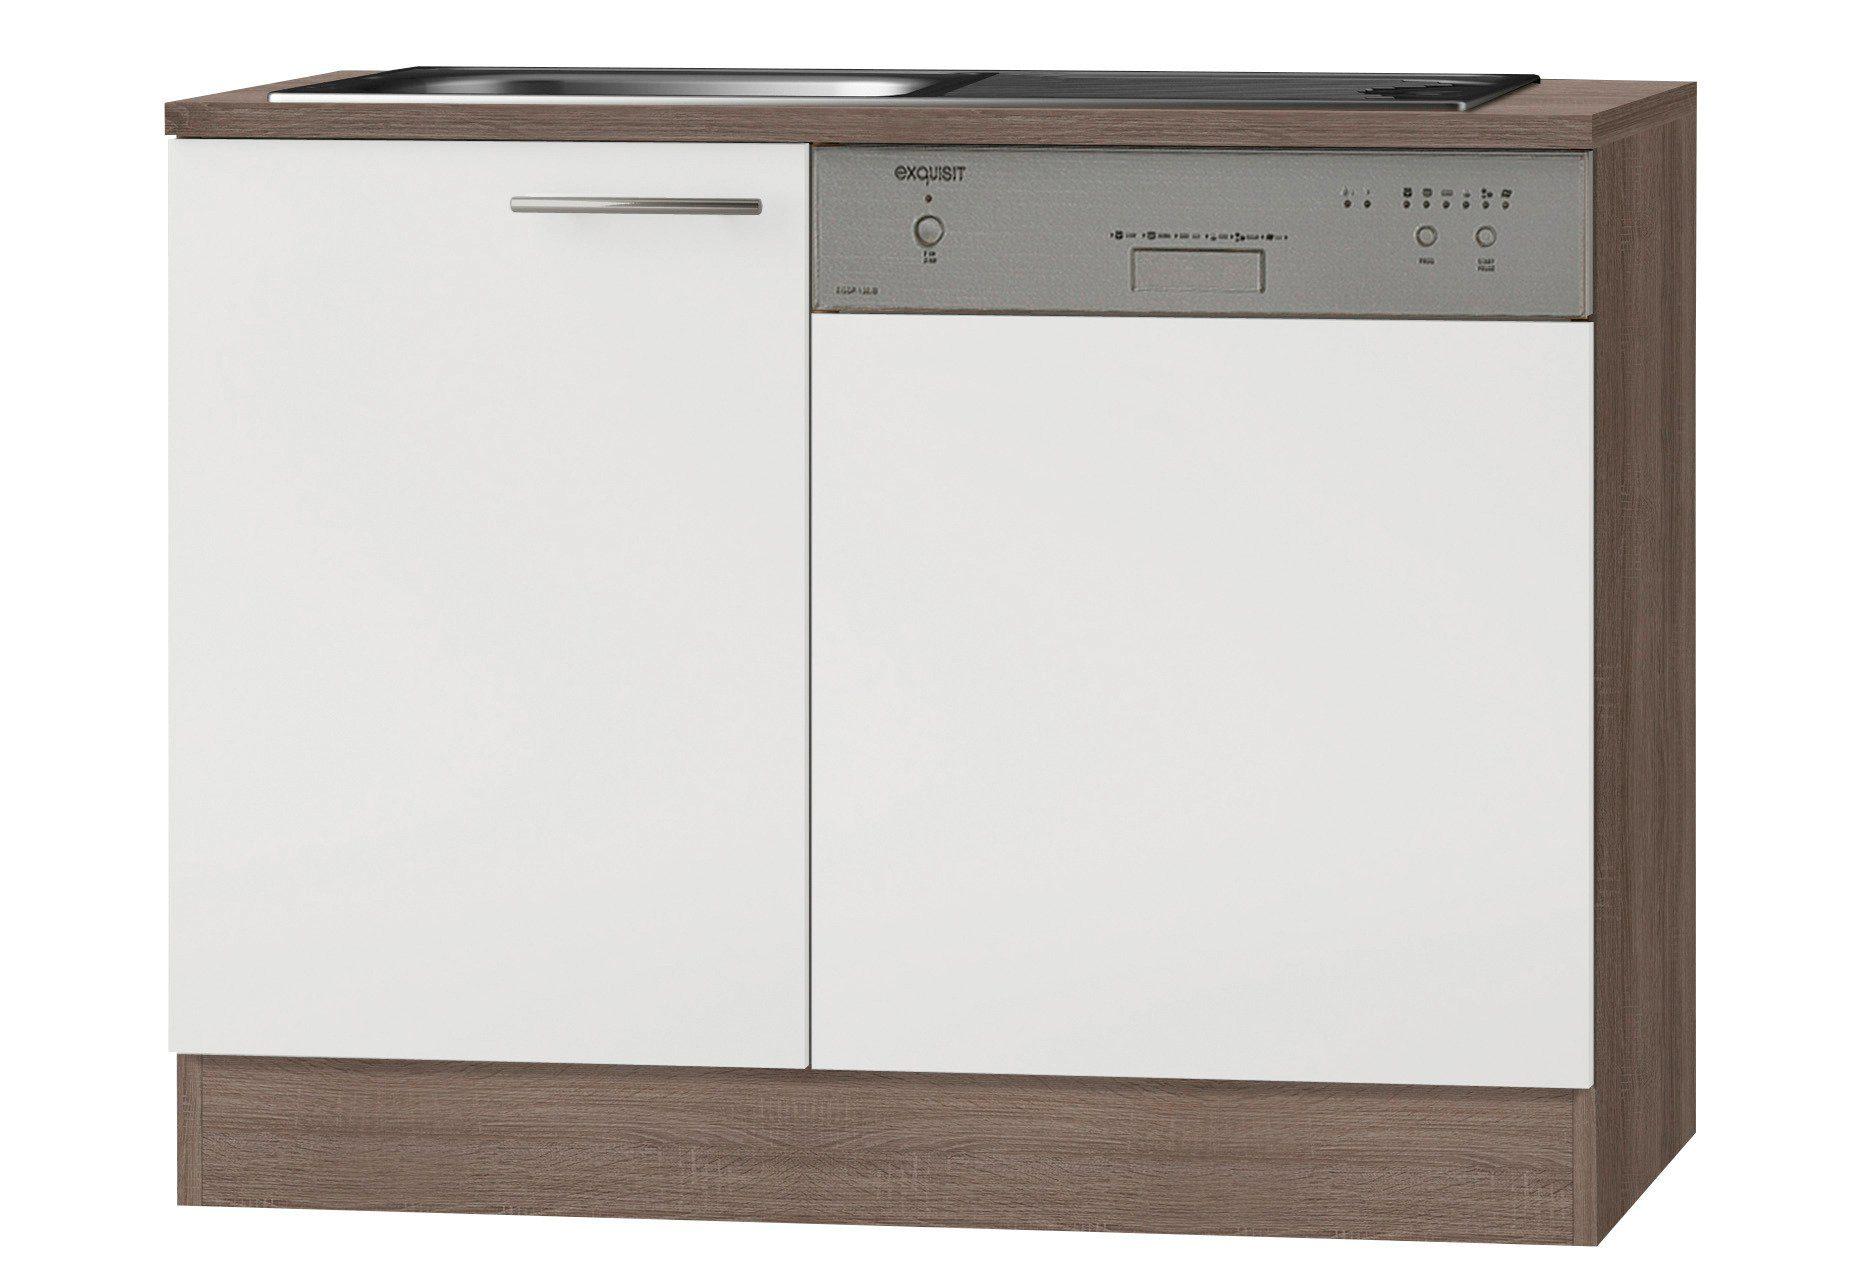 Optifit Spülenschrank »Rabar«, Breite 110 cm